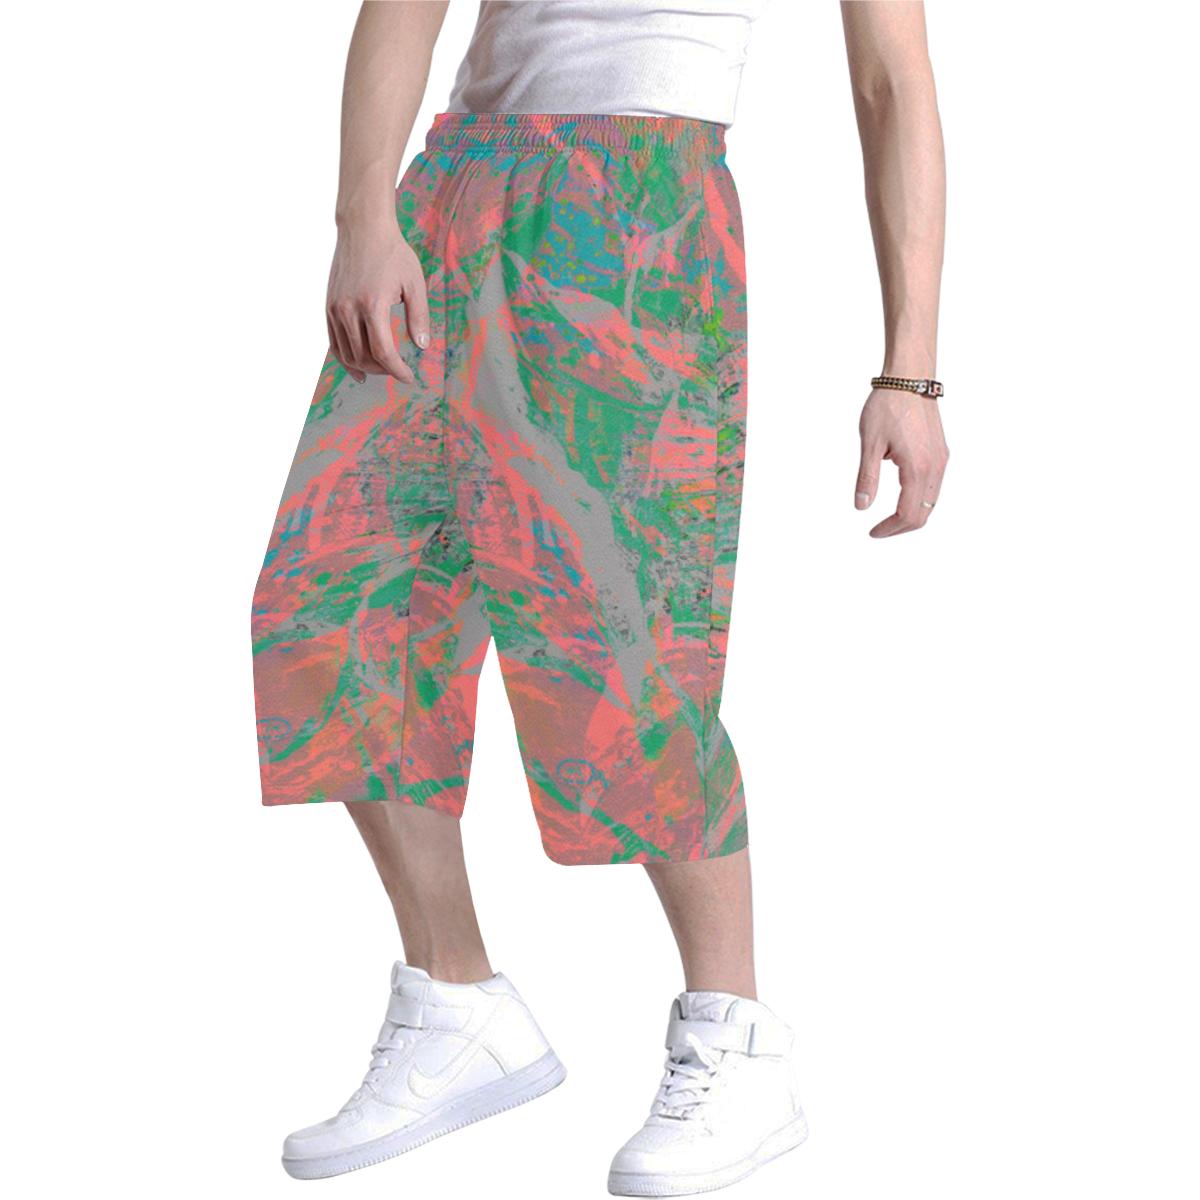 wheelVibe_vibe38 Men's All Over Print Baggy Shorts (Model L37)